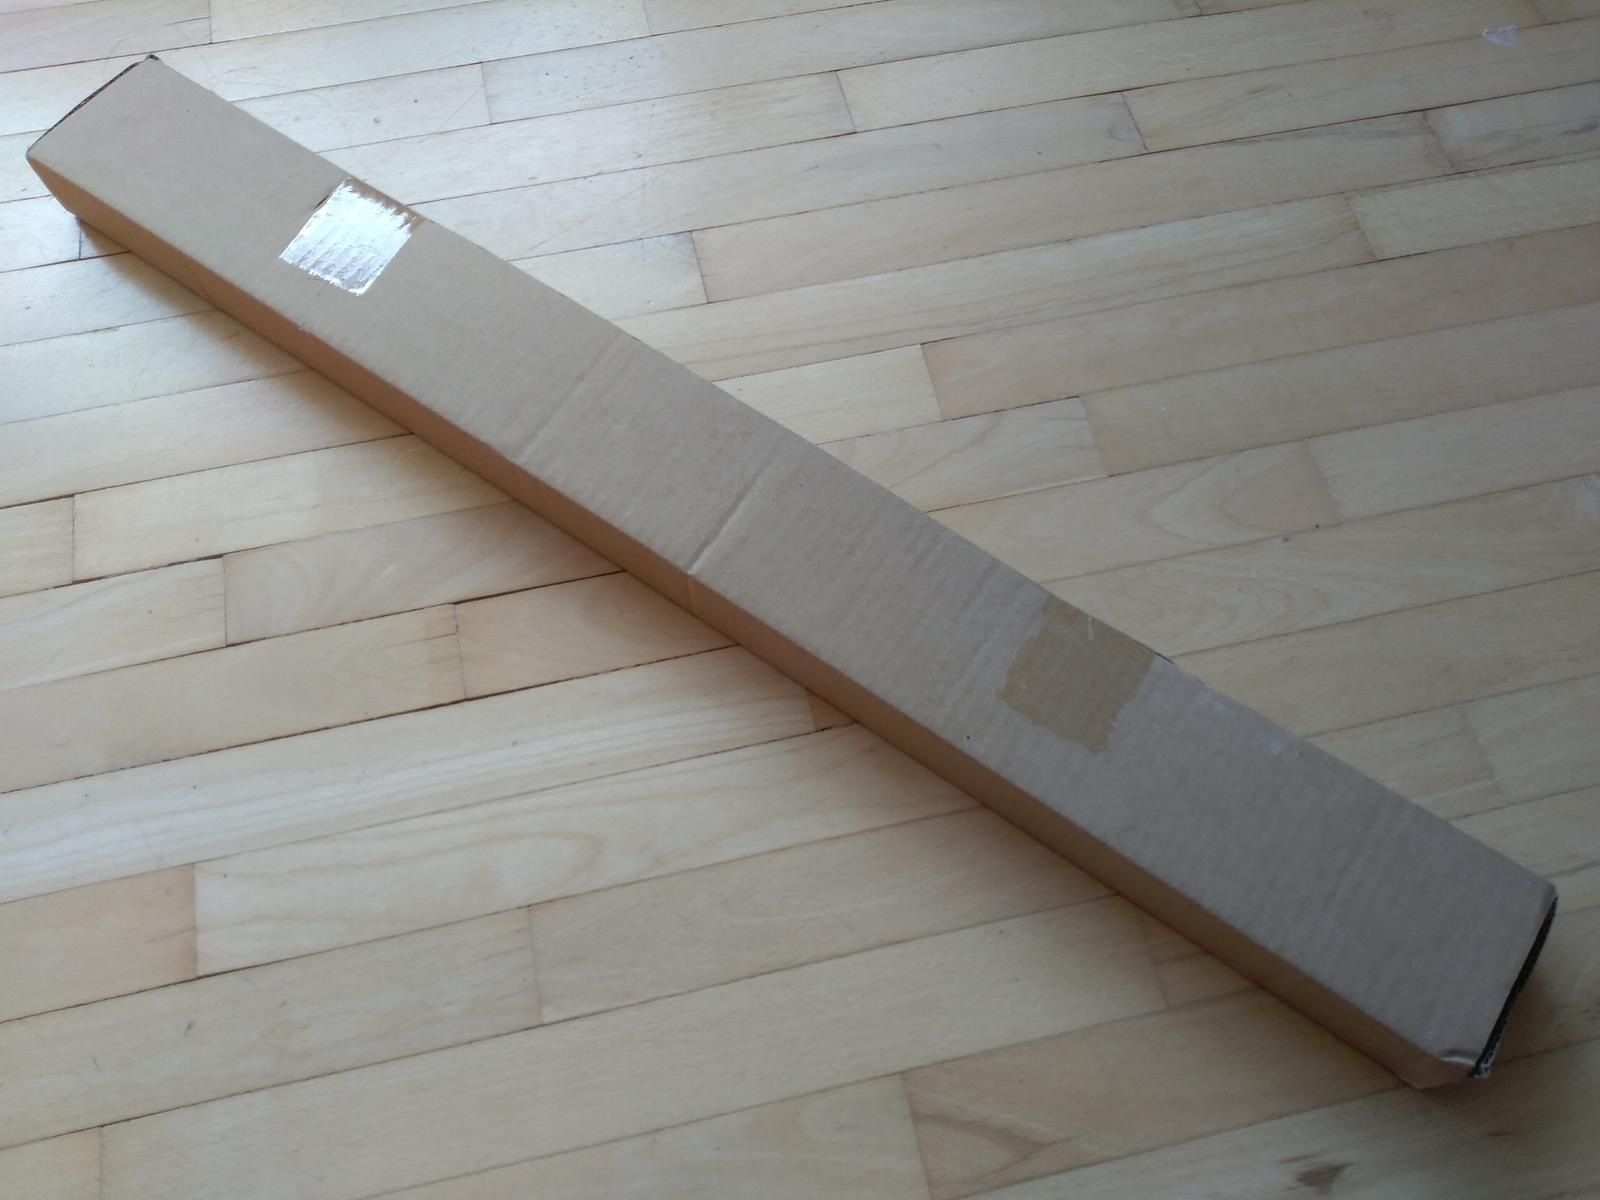 Nohy k vani Sanplast Comfort 150x100 - Obrázok č. 1